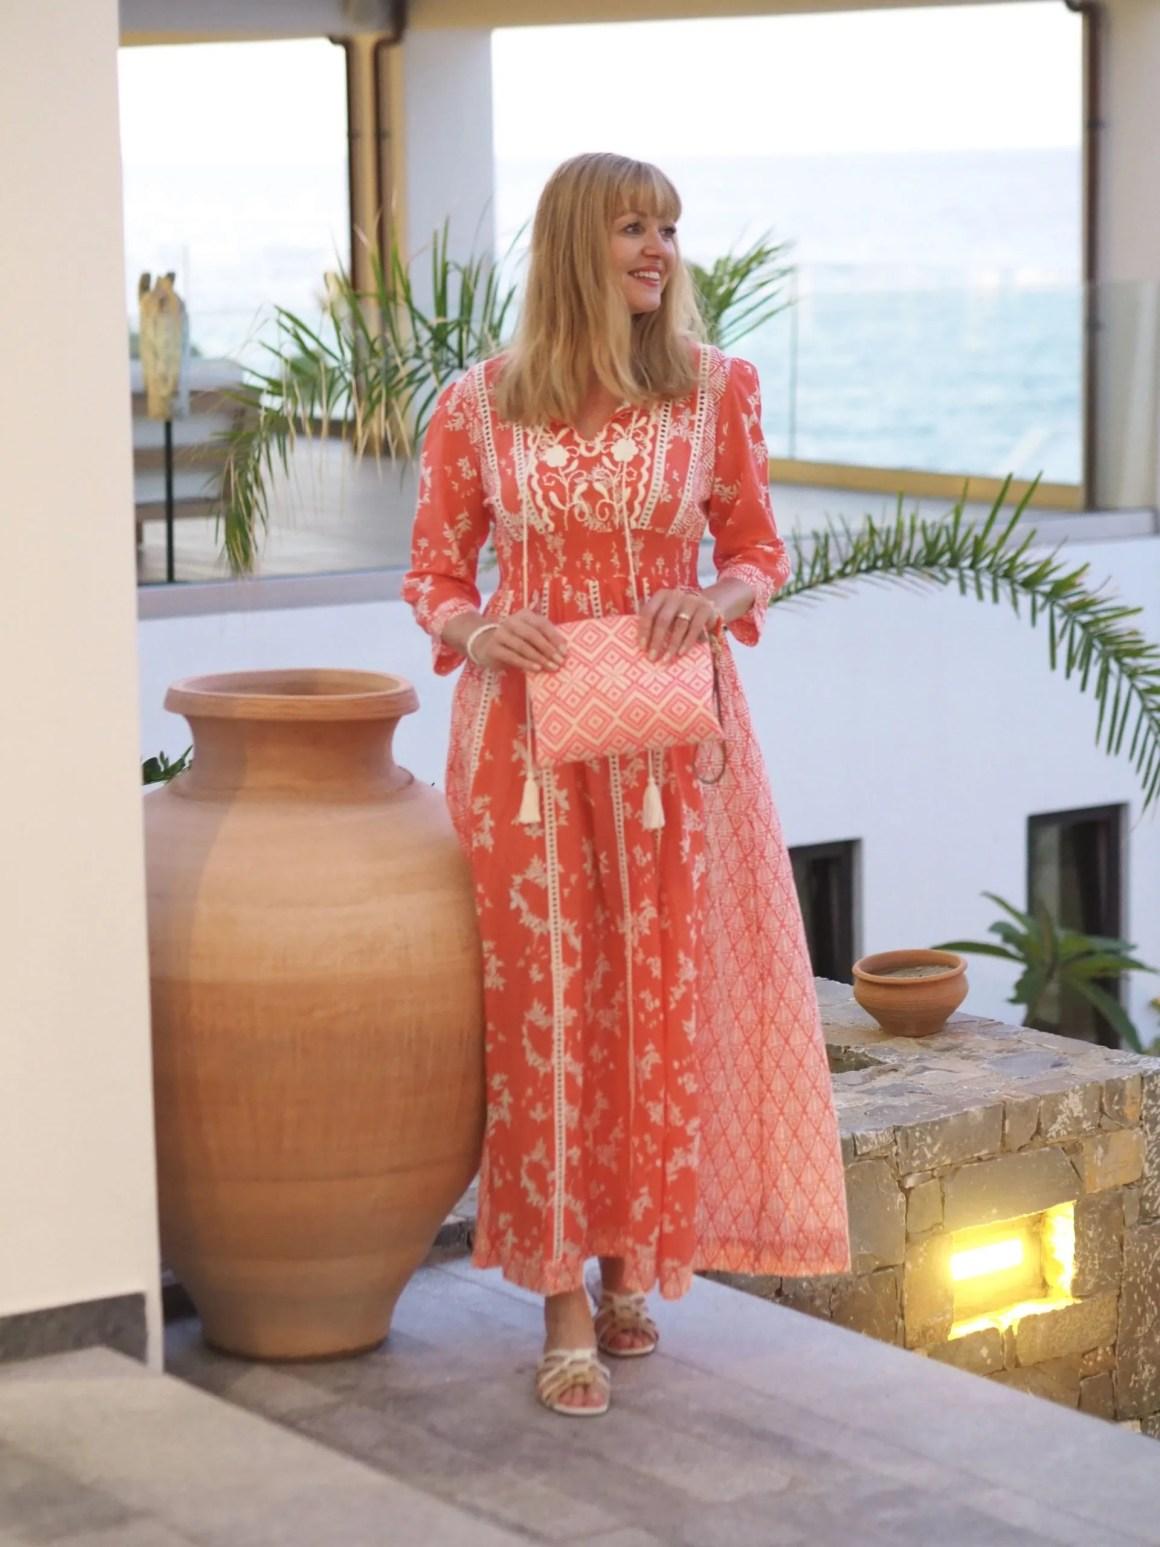 orange and white printed maxi dress